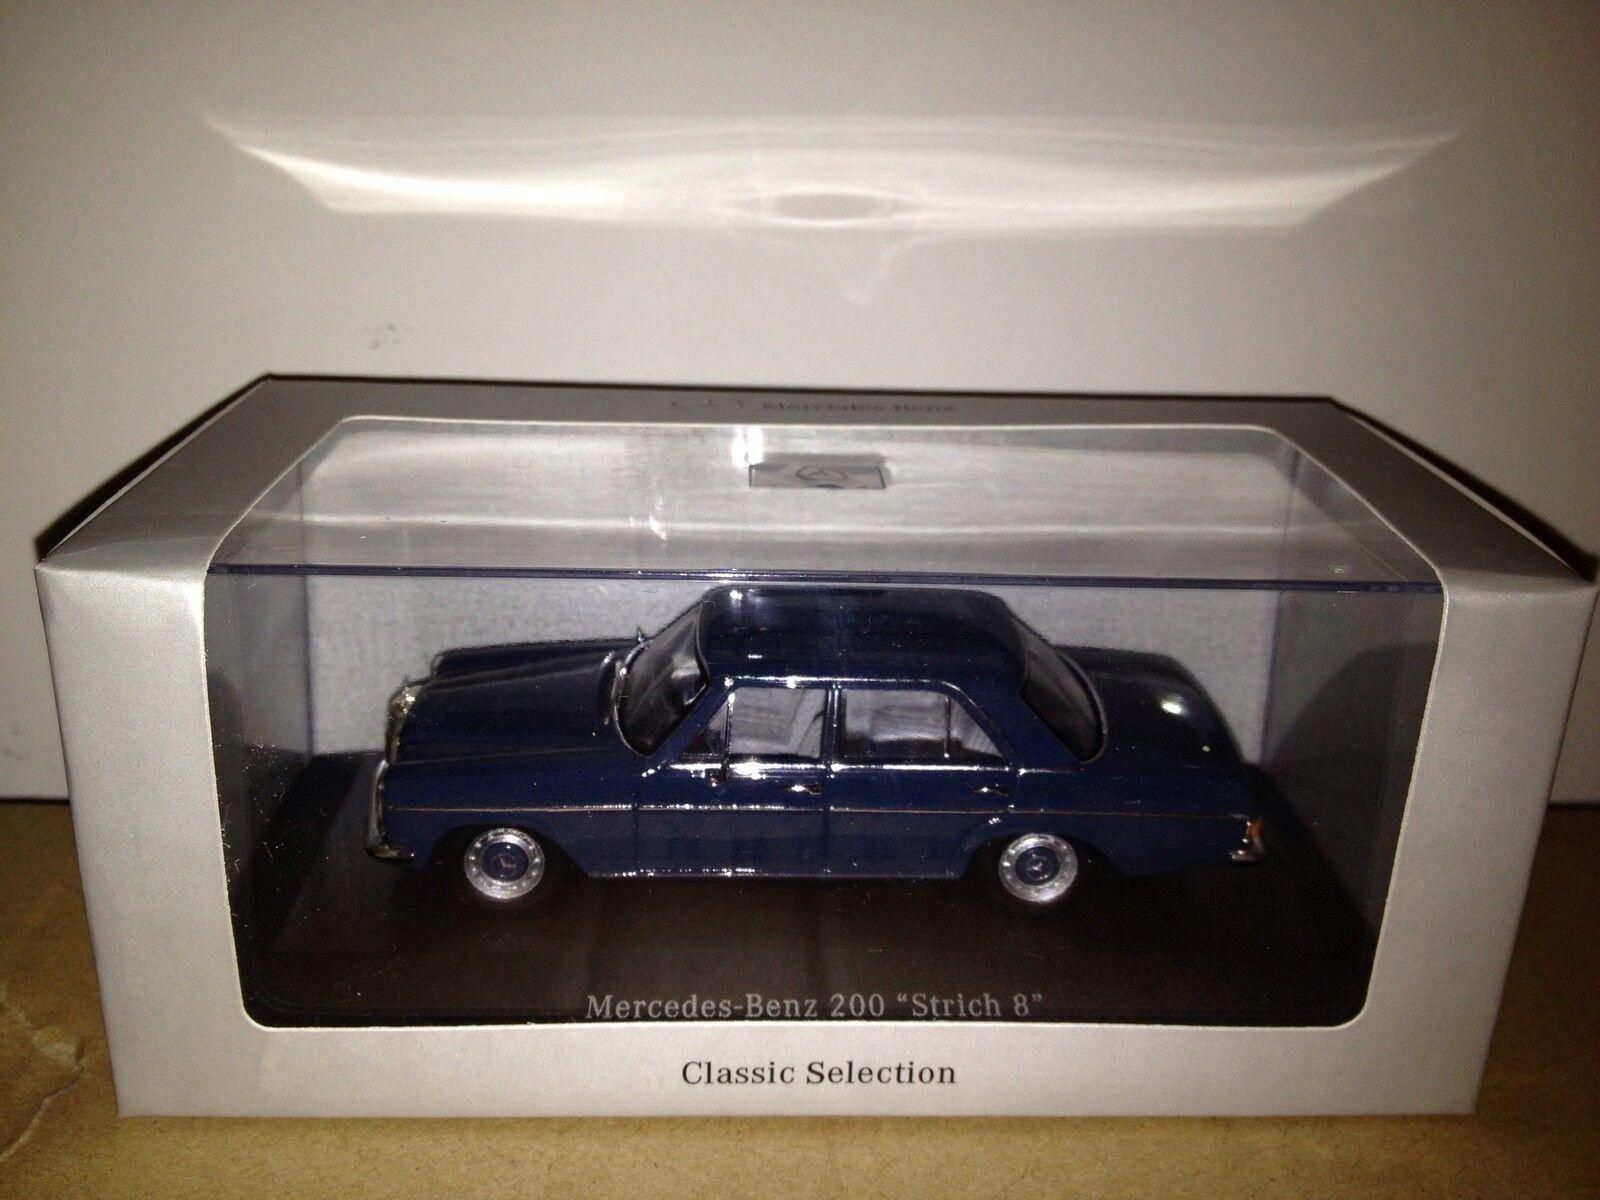 Mercedes strich 8 200 minichamps blau 1 43 dealer edition  super selten